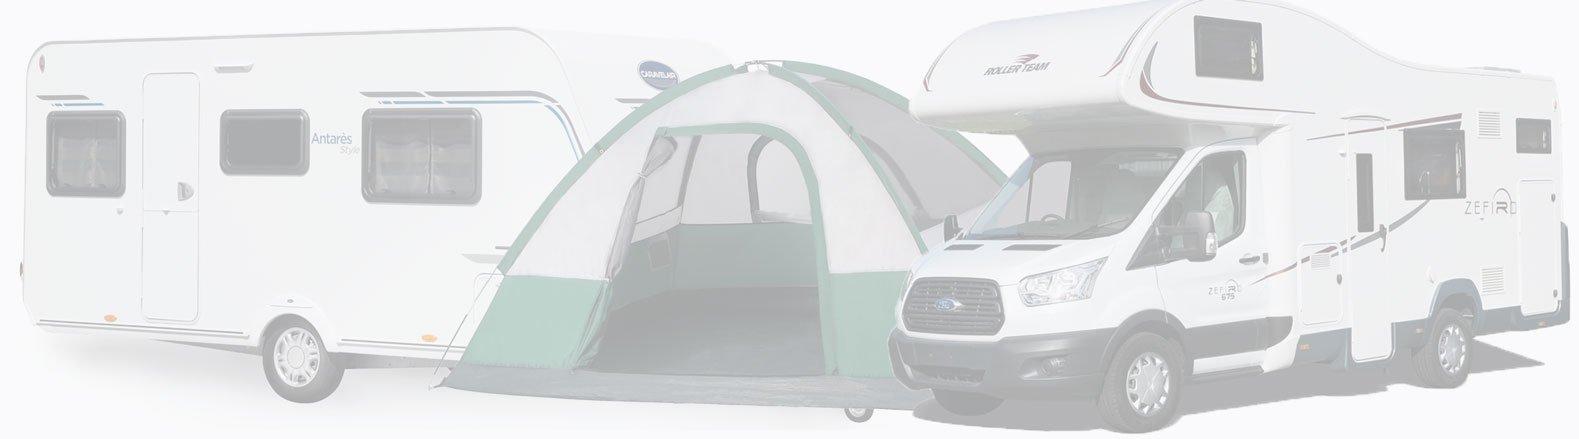 caravan-tent-motorhome - parc verger